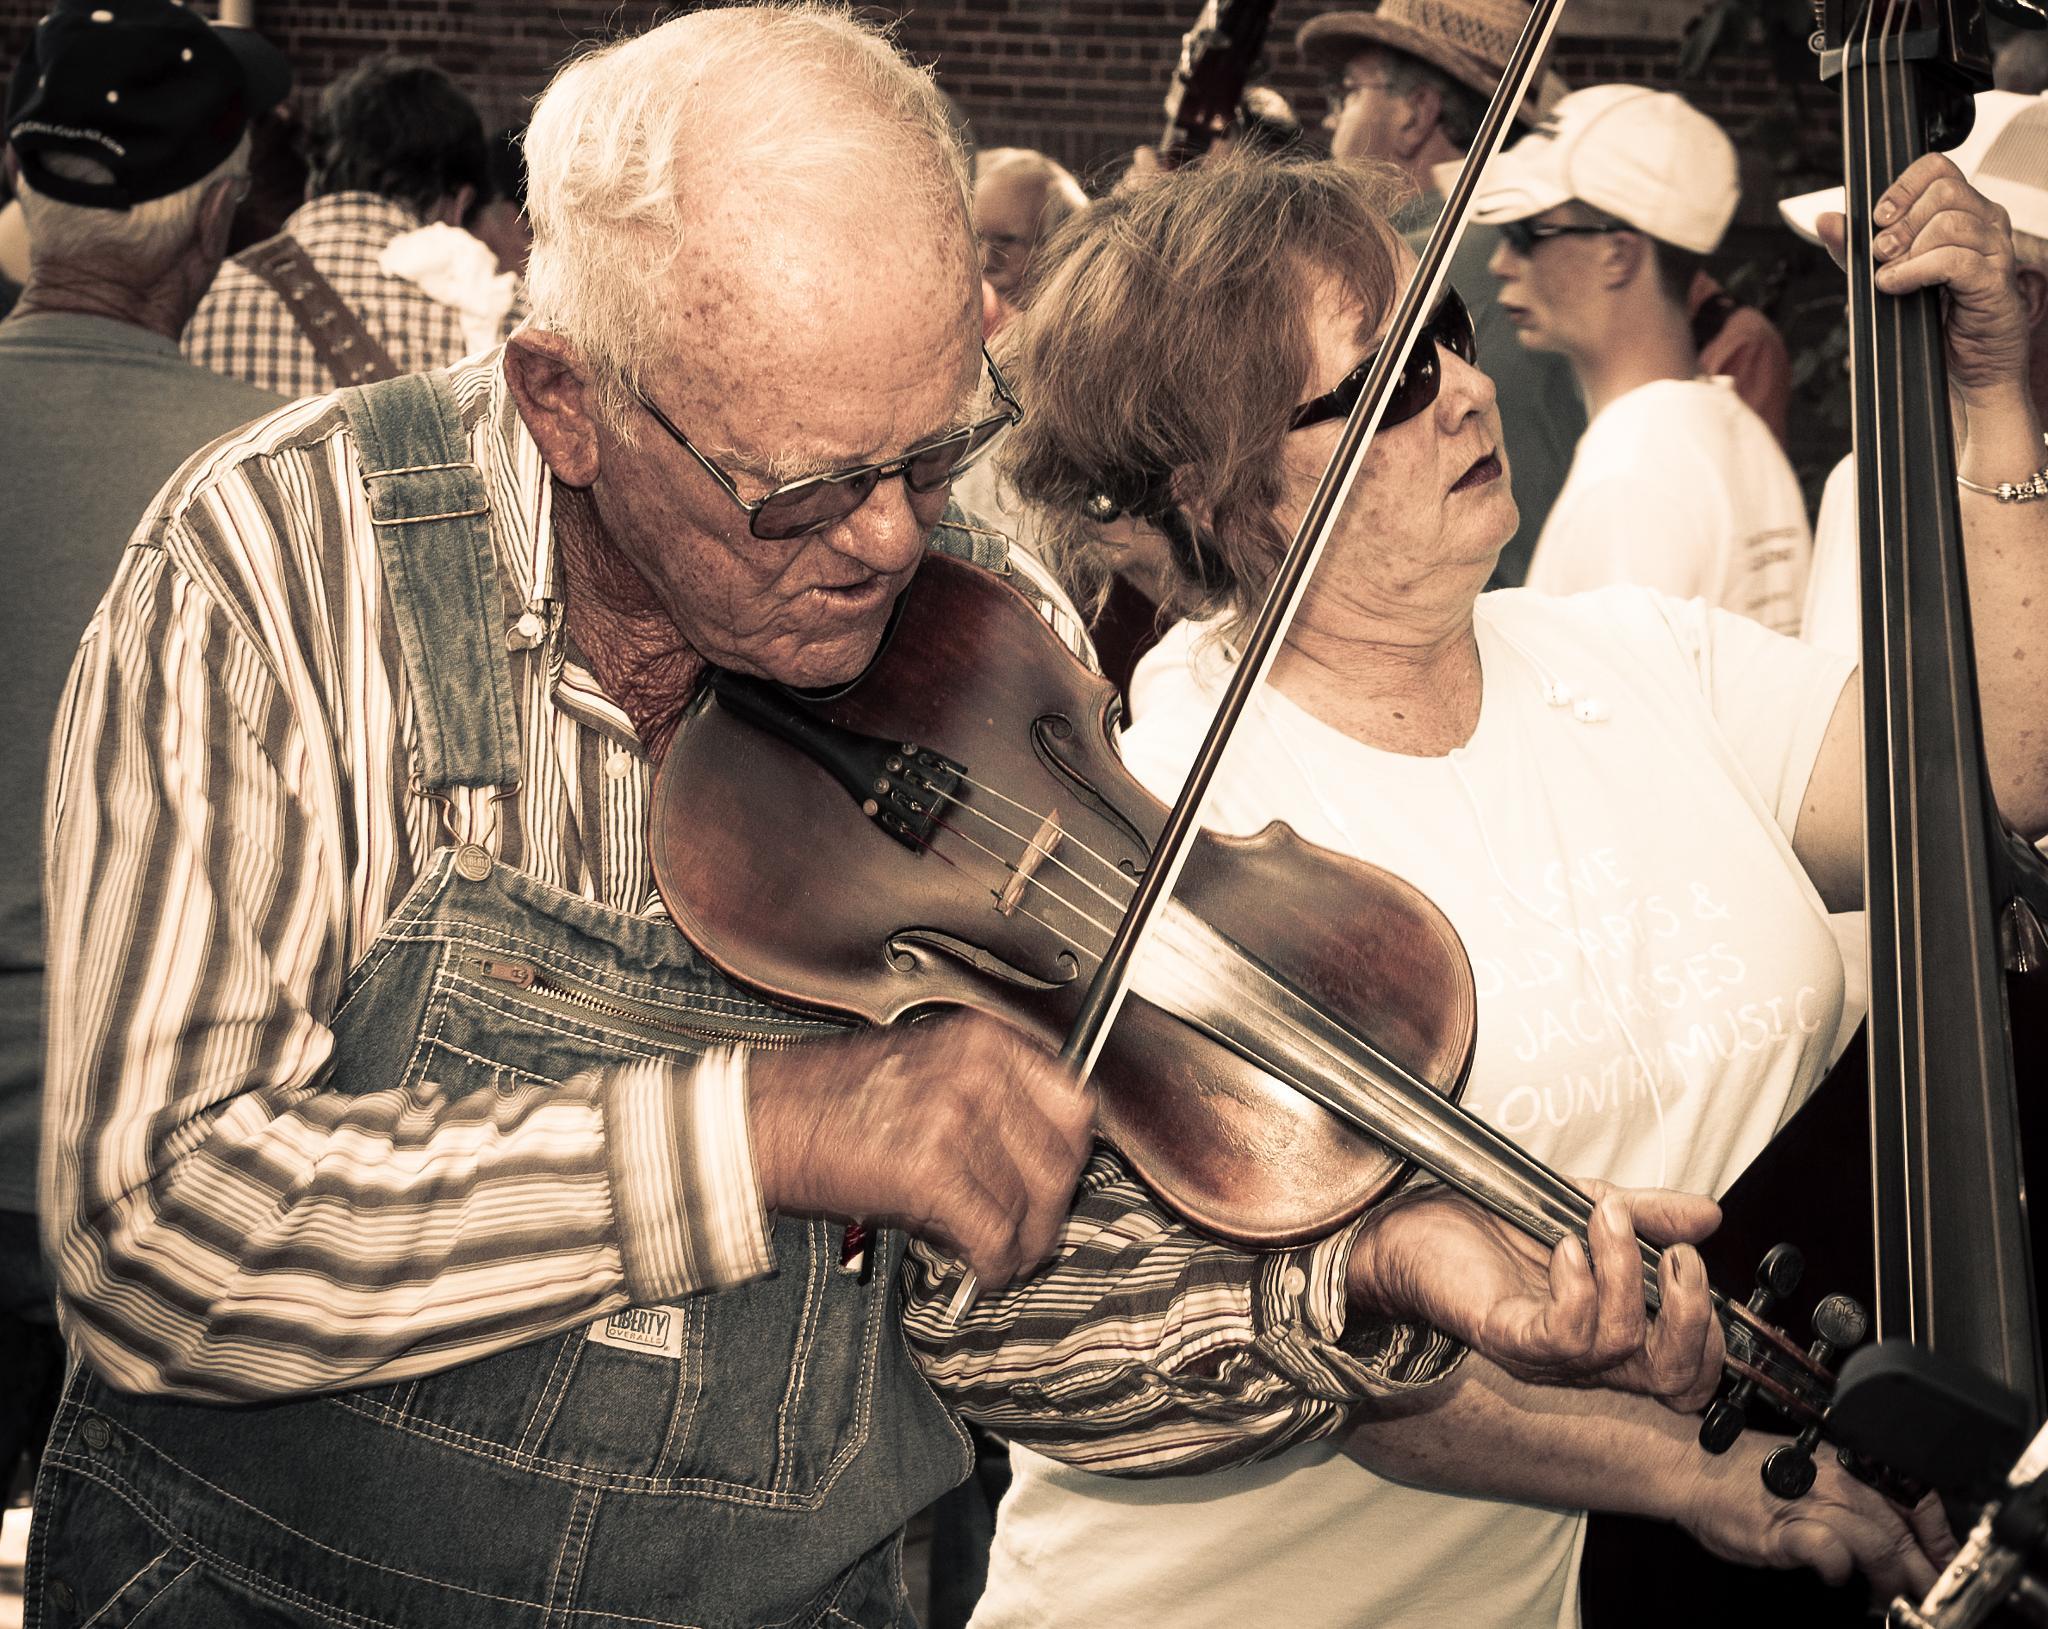 Fiddle & Bass by wacissa